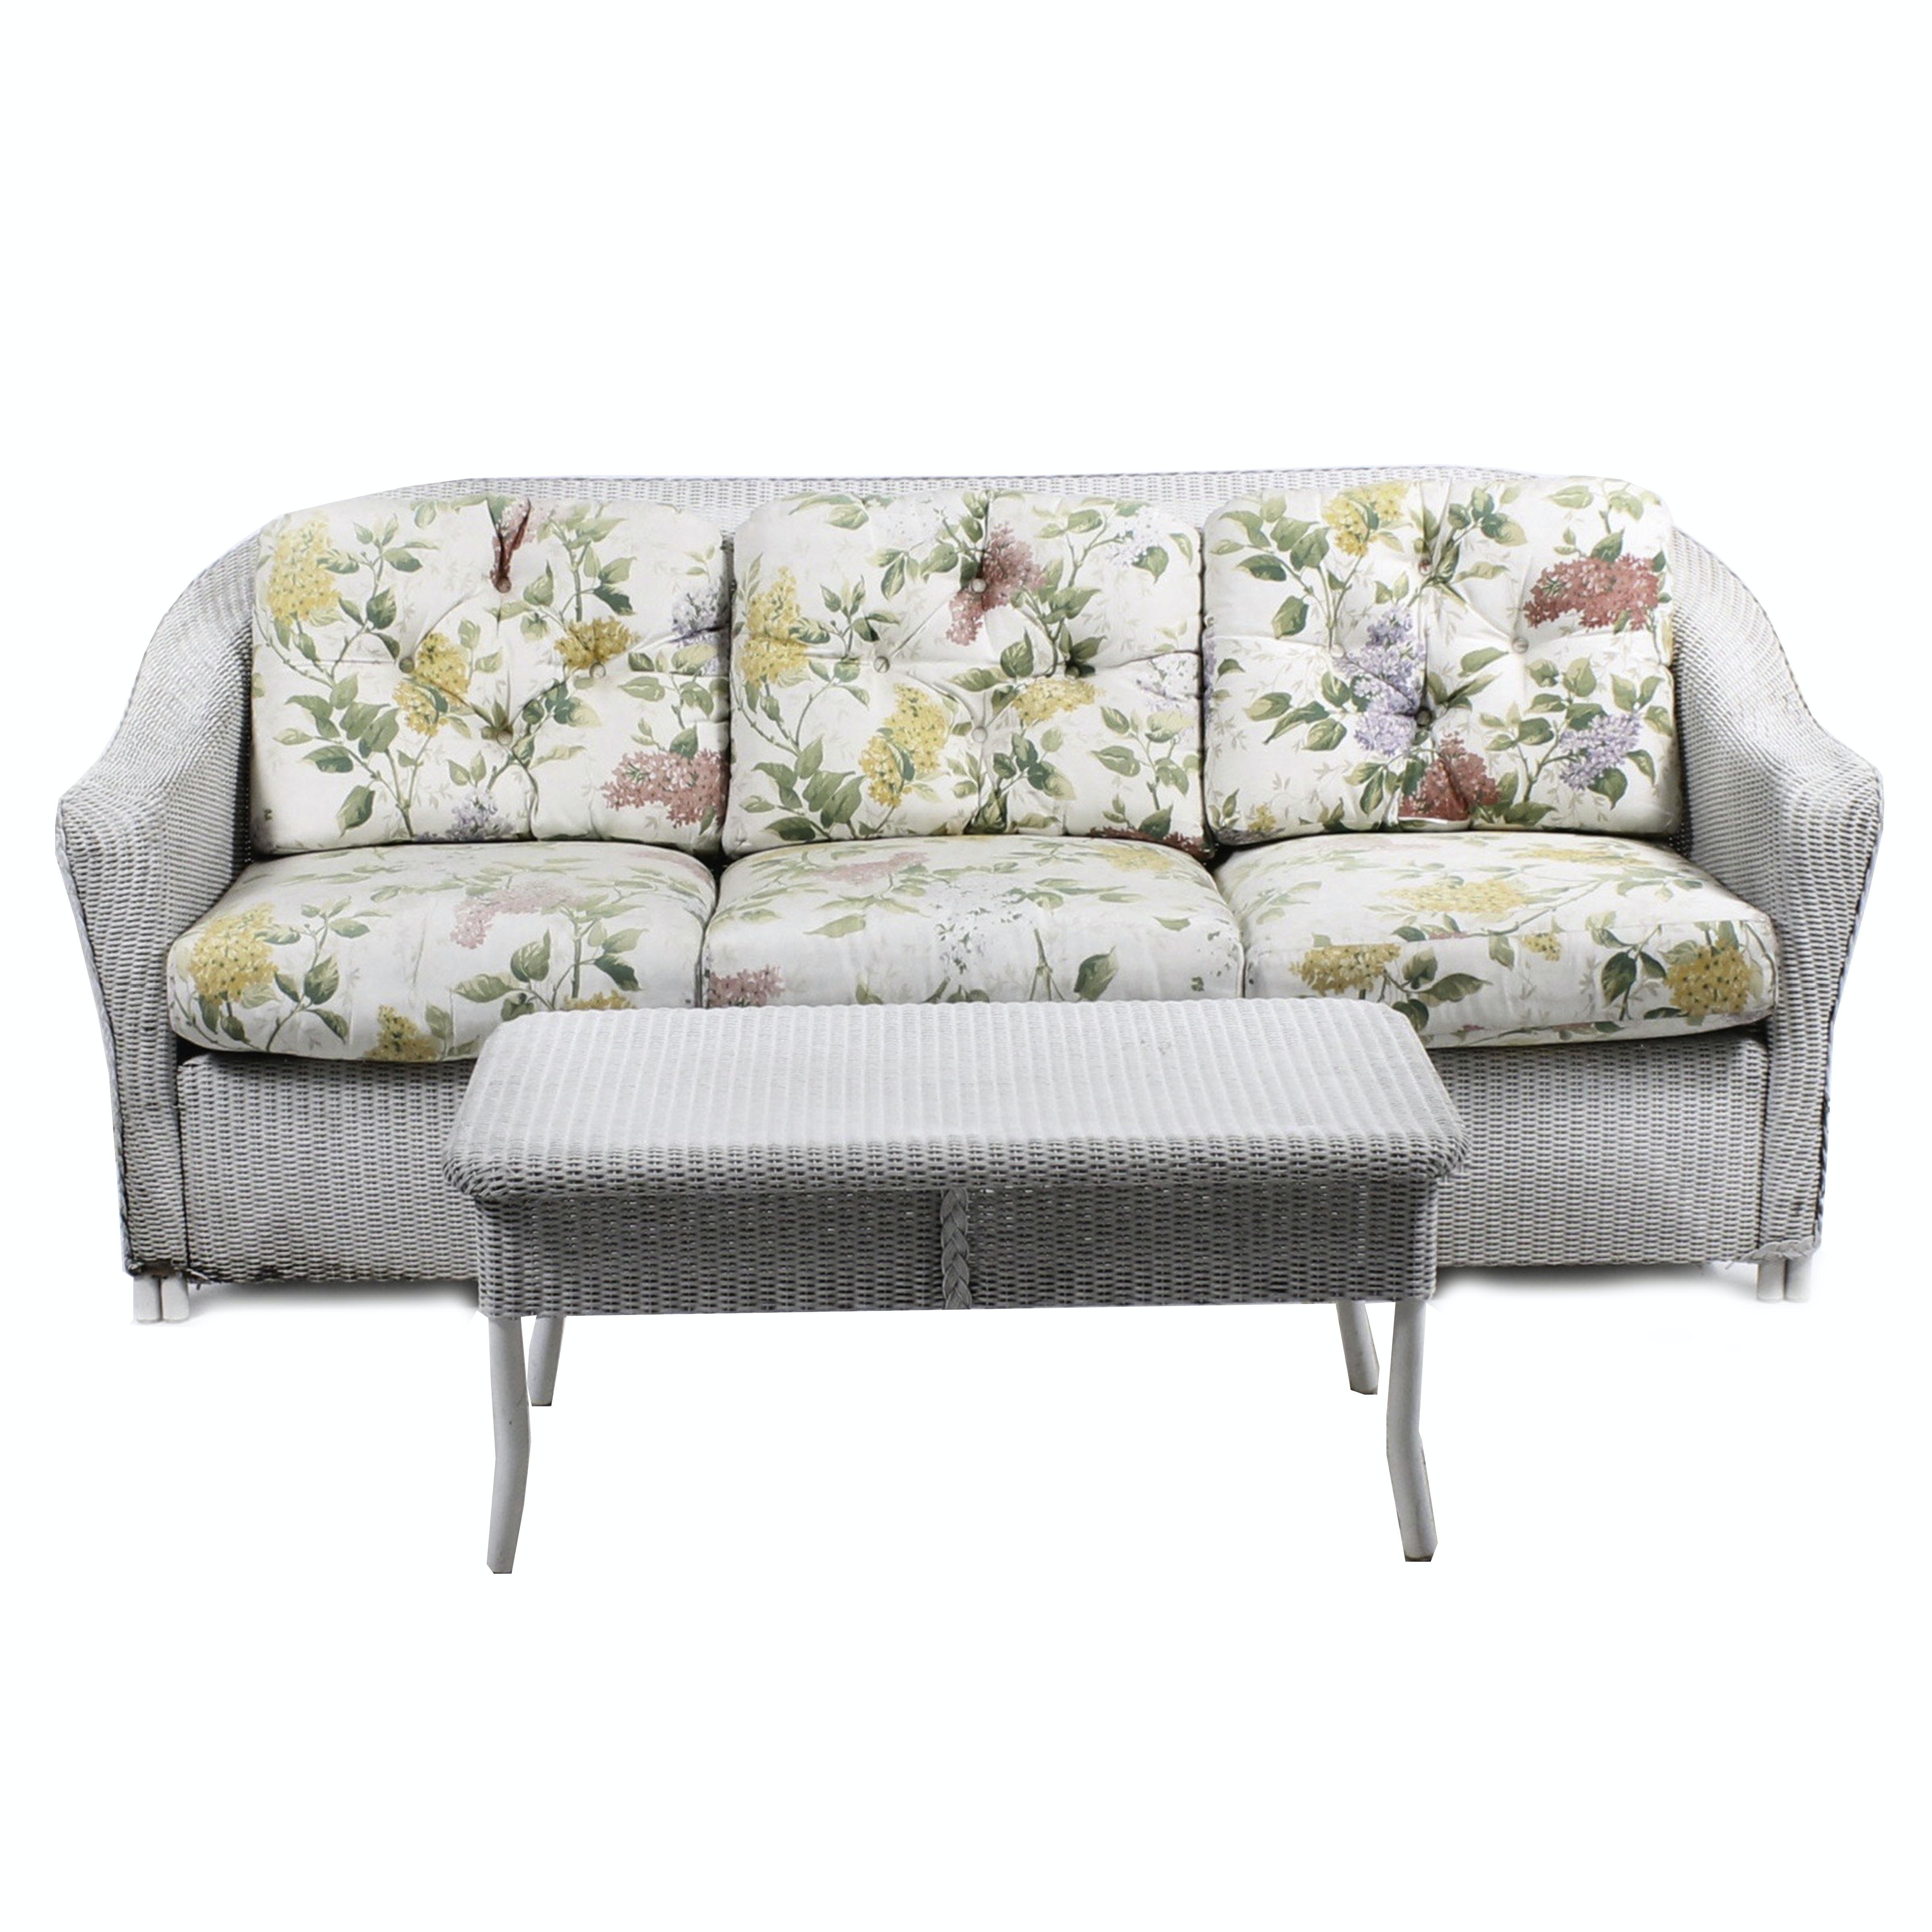 Vintage Lloyd Loom White Wicker Sofa and Coffee Table